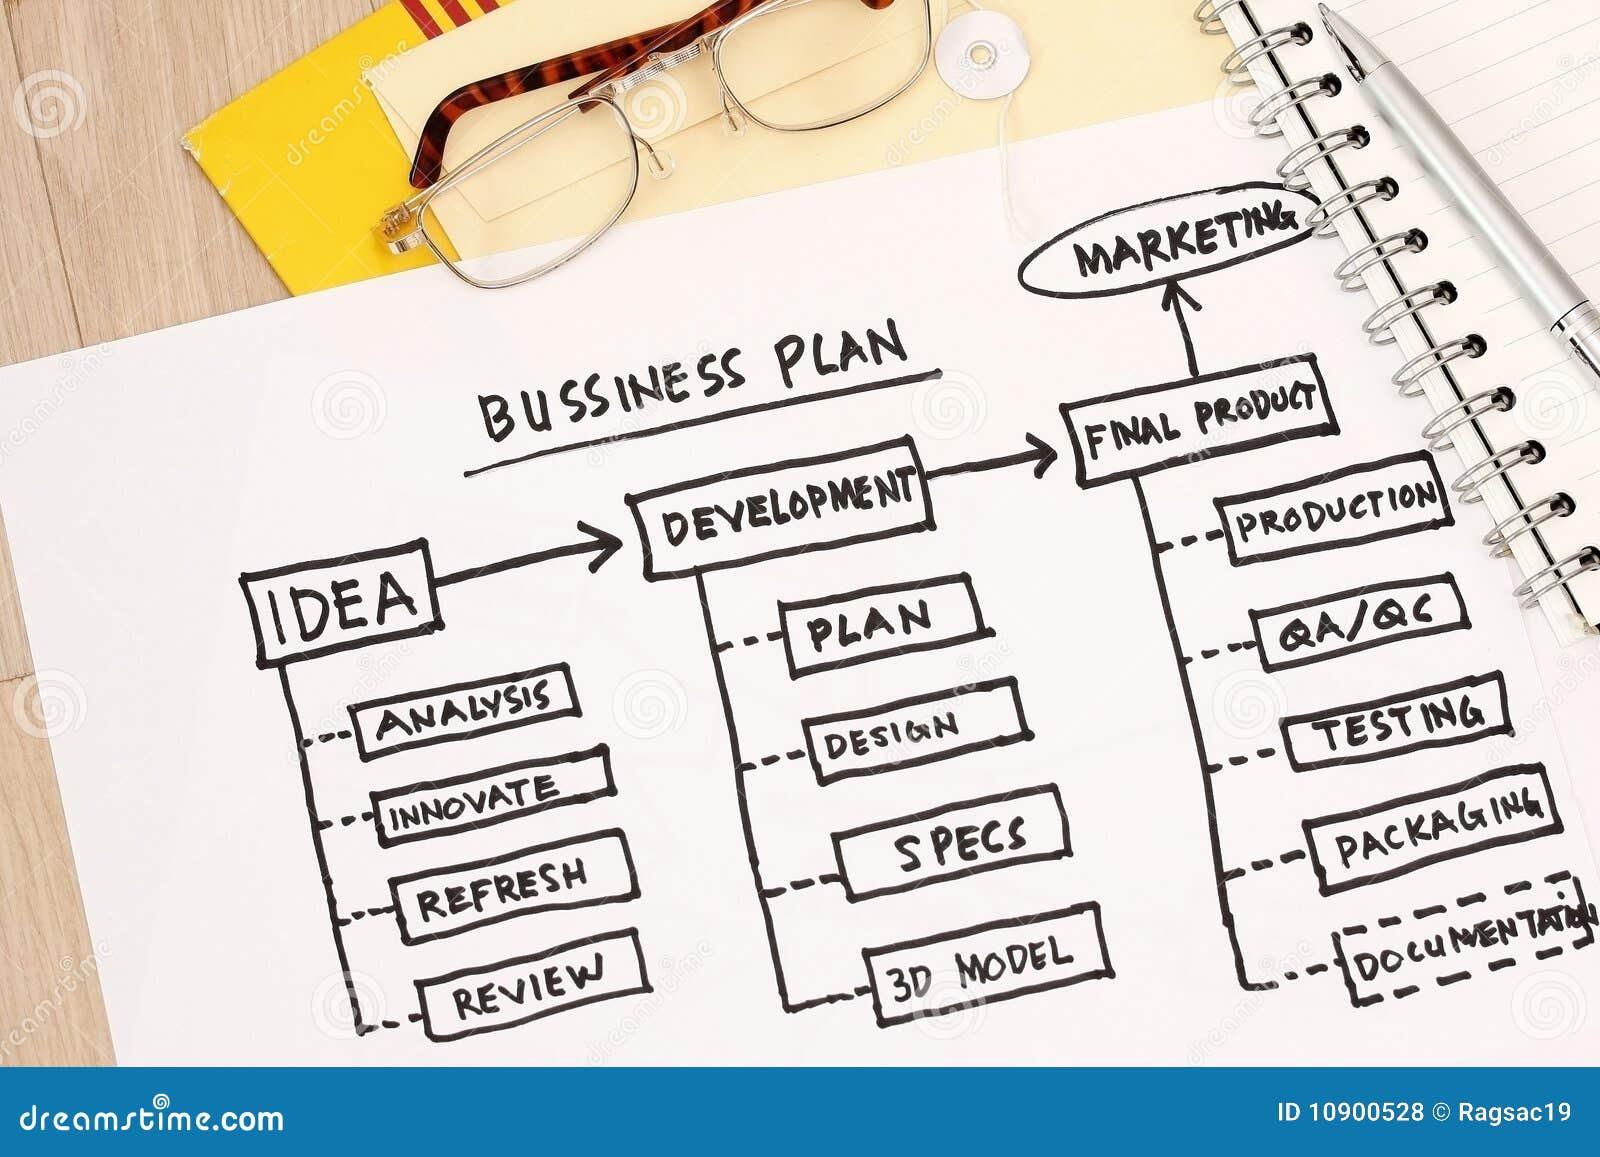 Business plan uses